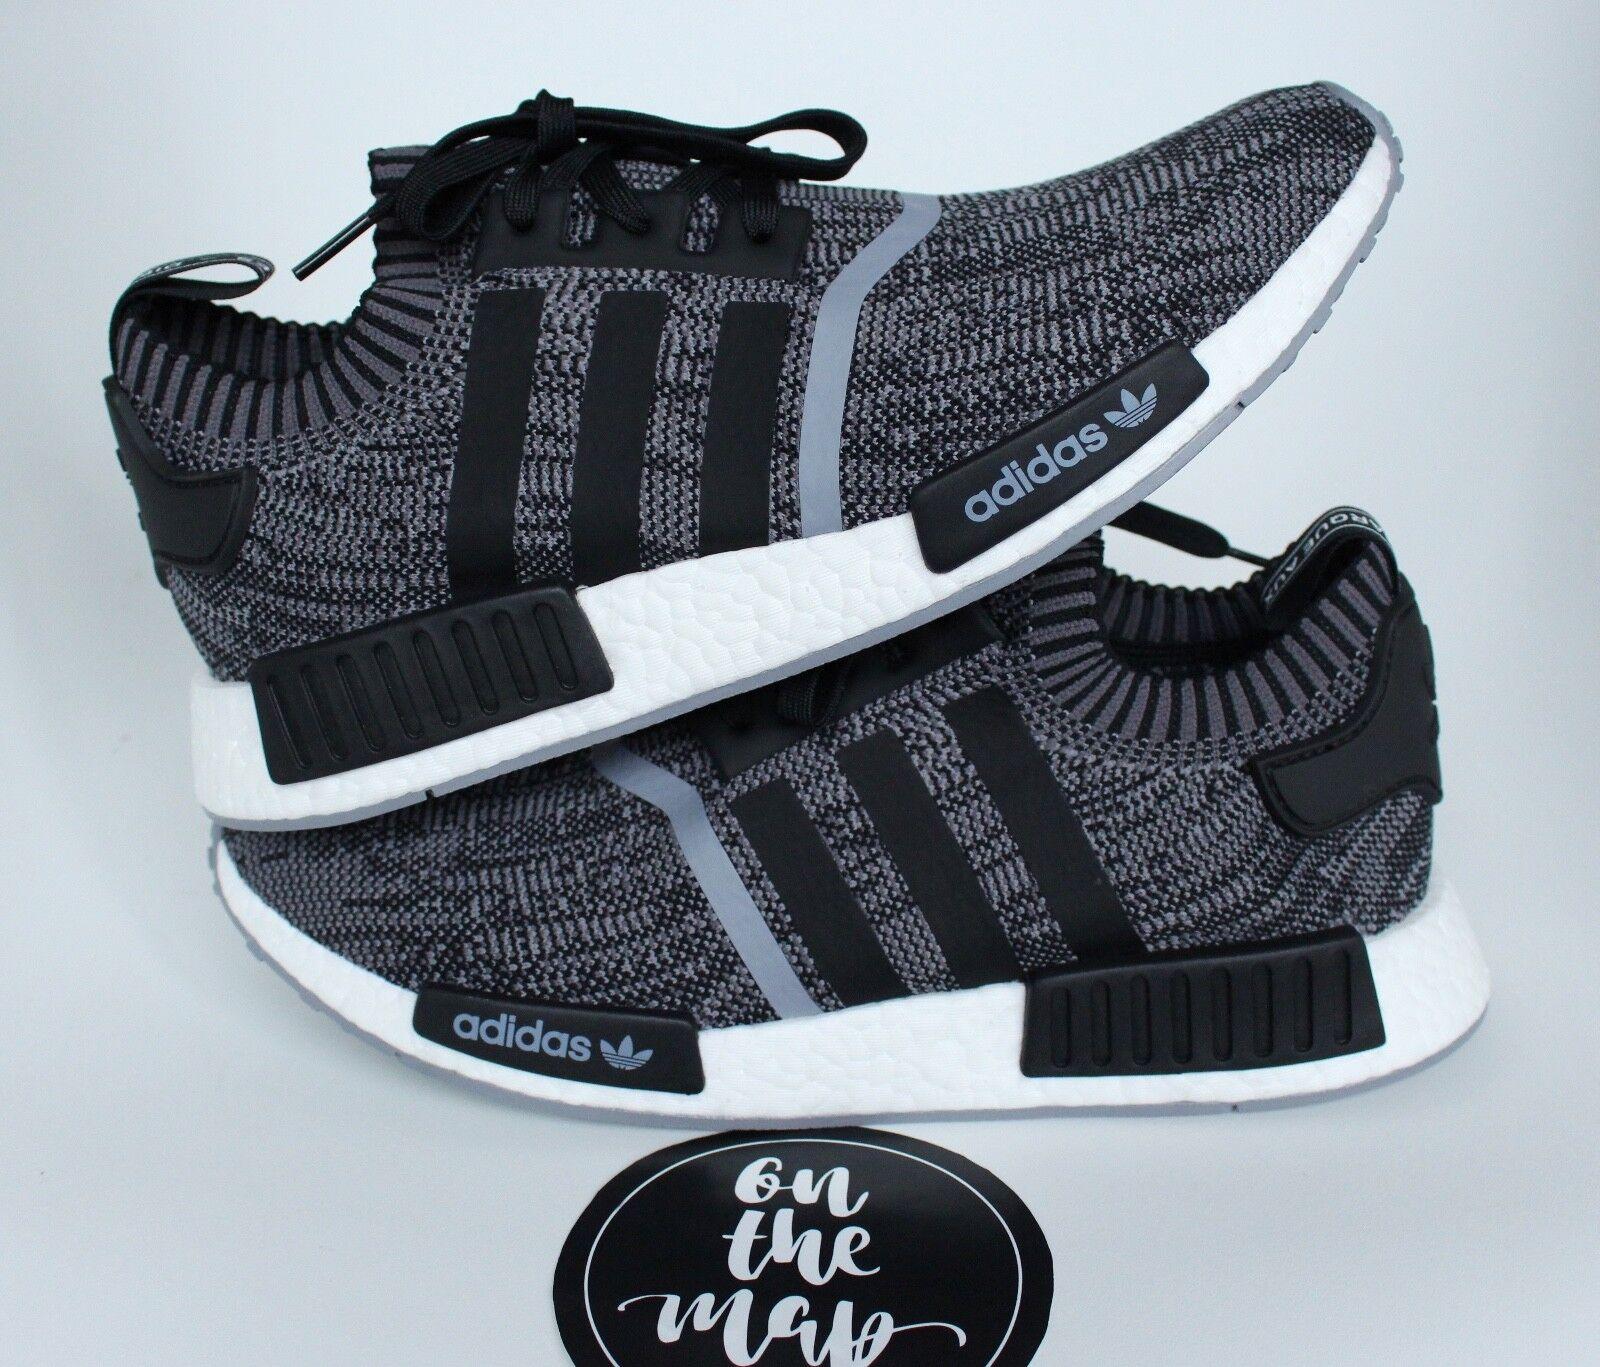 Adidas nmd r1 grau - schwarz schwarz schwarz schoenen ai camo pk cq1863 4 5 6 7 8 9 10 11 12 13 neue 469ecc